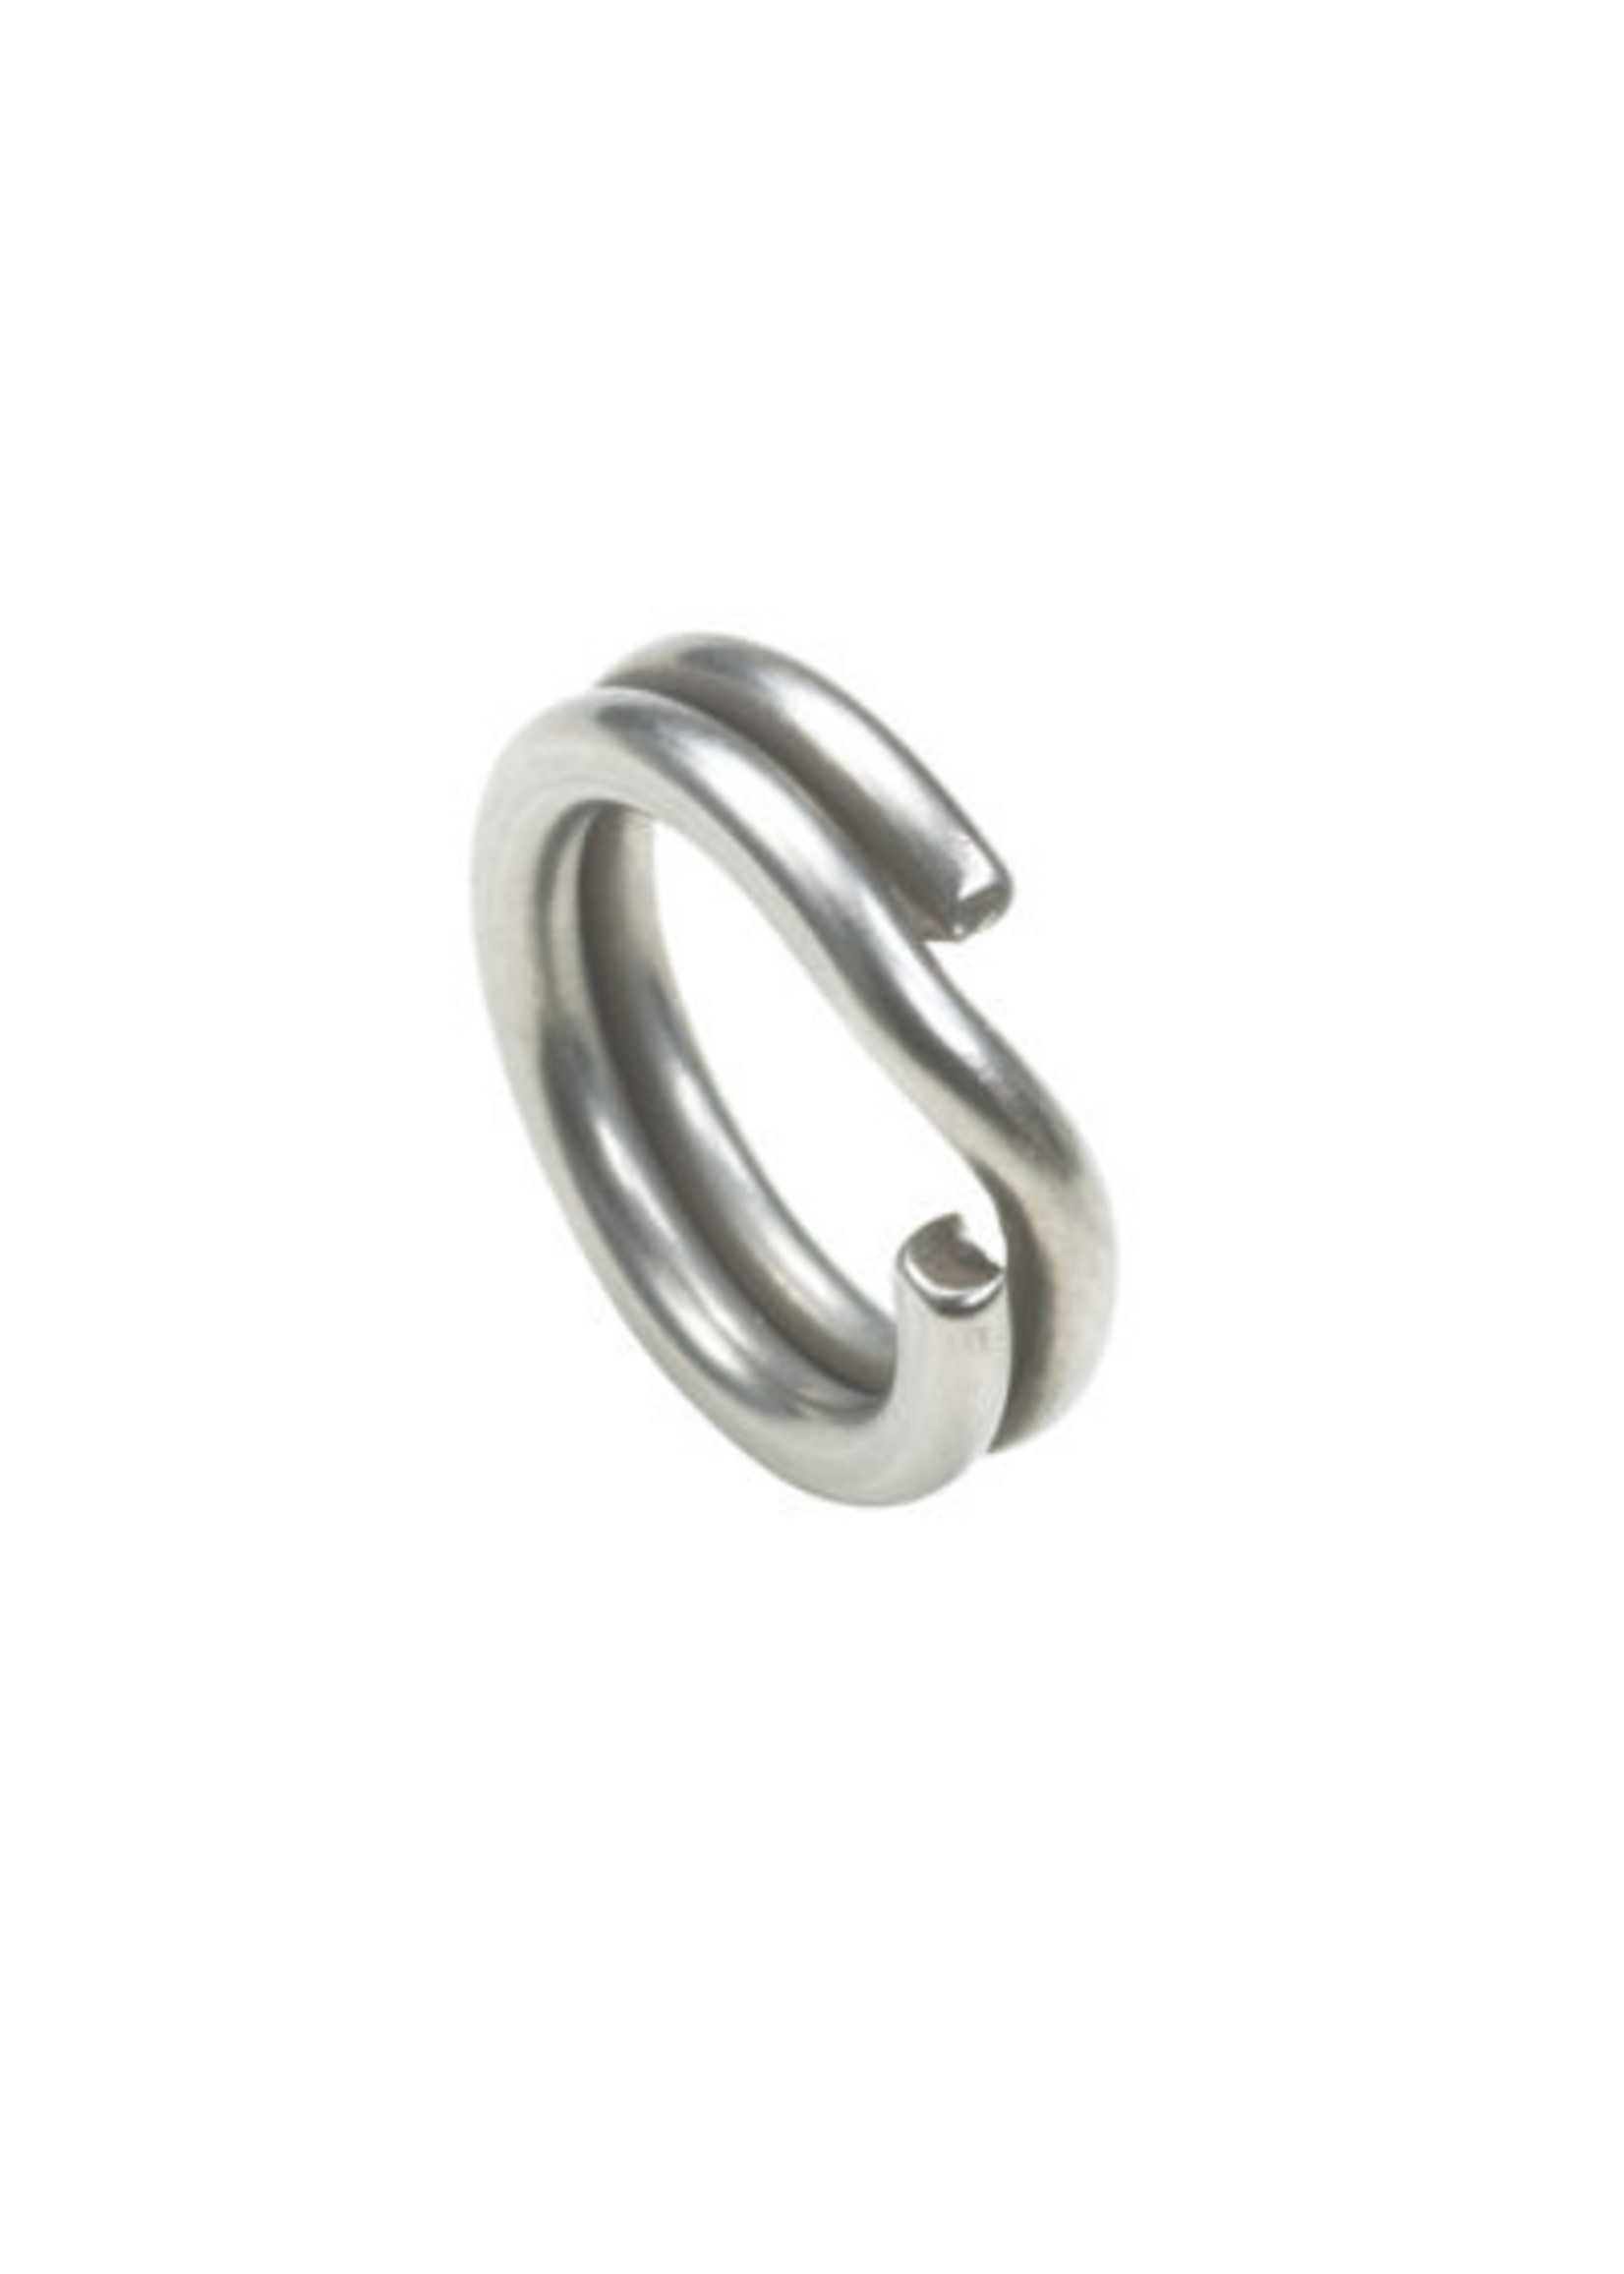 Owner Owner Hyperwire Split Ring 11